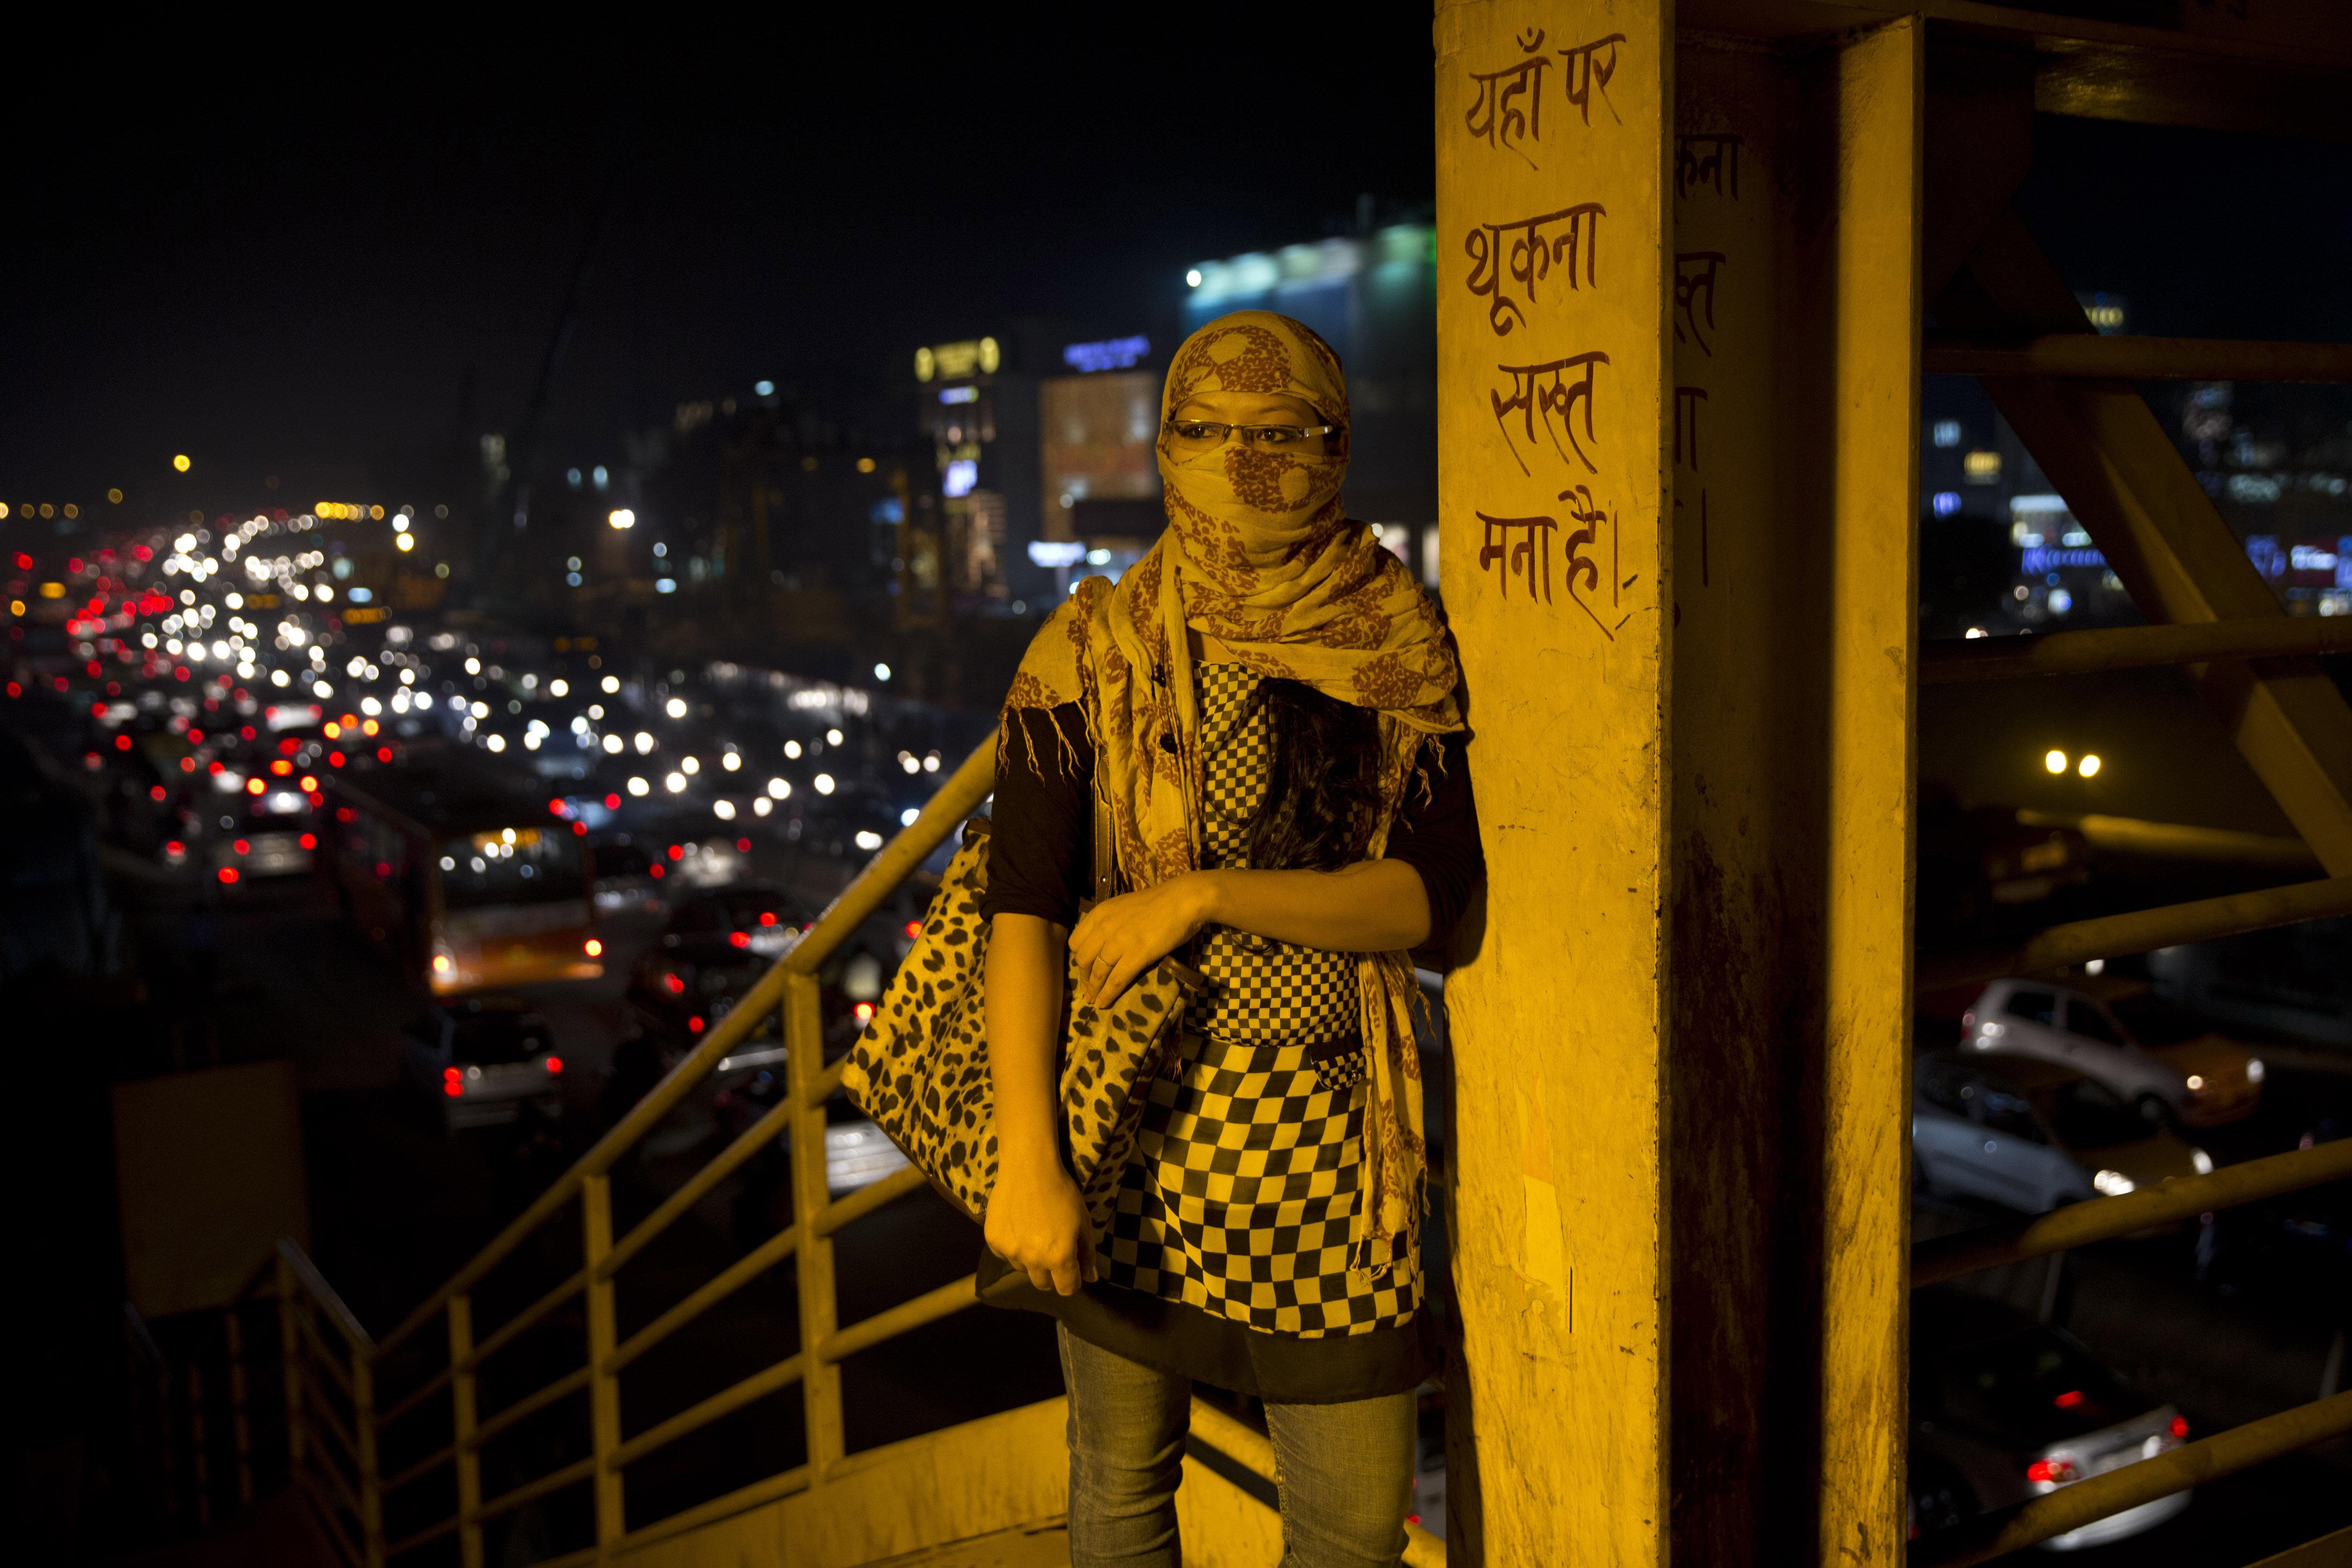 India-New Delhi-Air-Pollution-Toxic air-Paris climate talks-Climate change